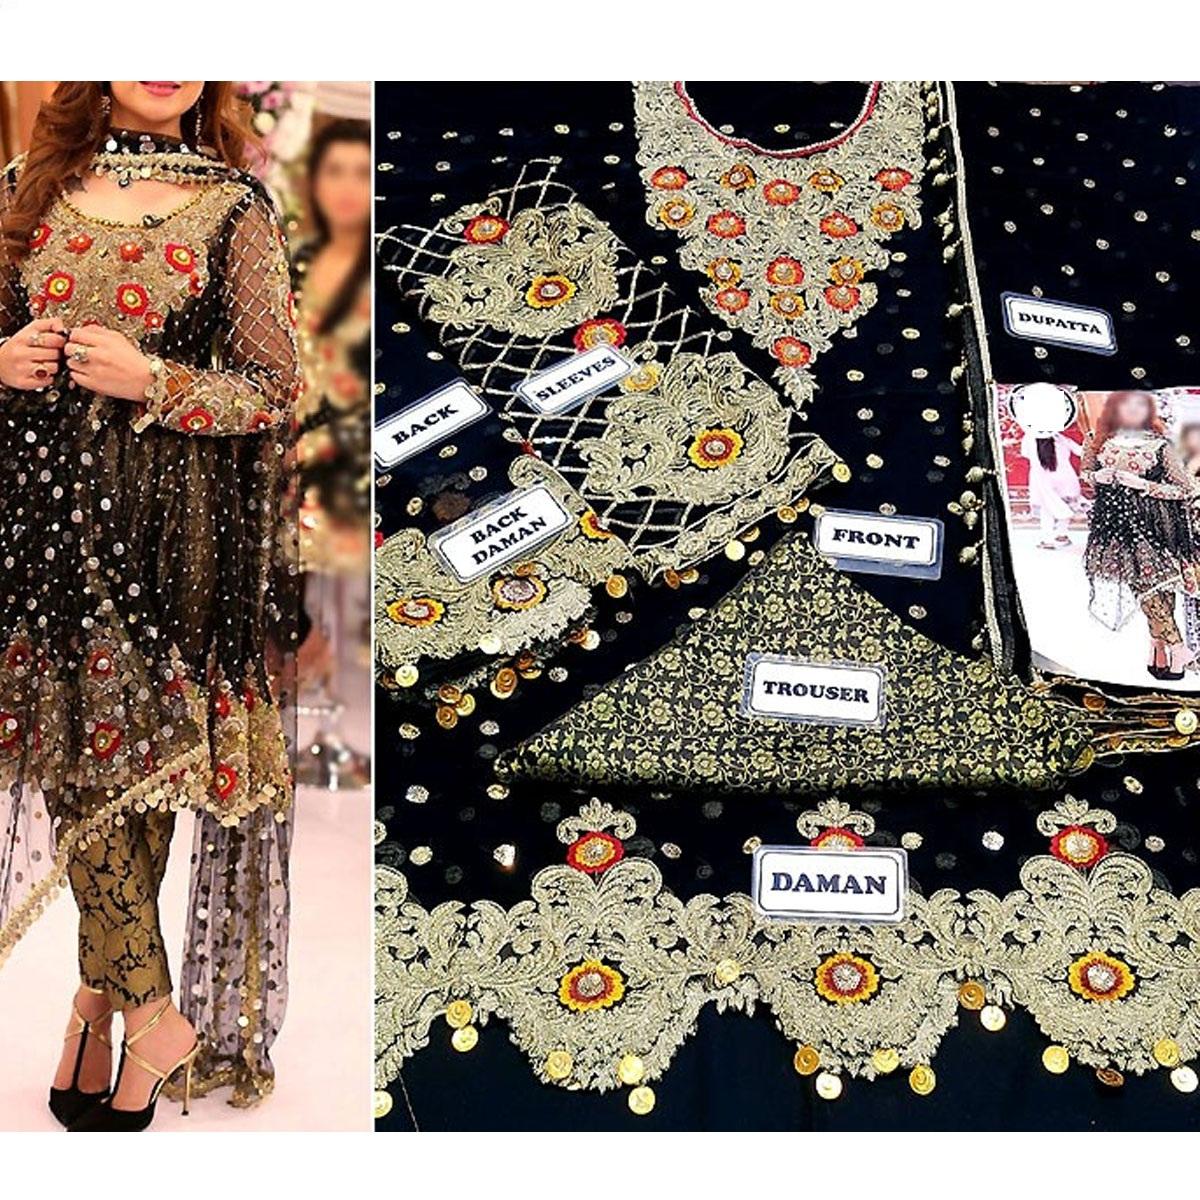 Heavy Embroidered Black Chiffon Wedding Dress - (CHI-328) Gallery Image 3